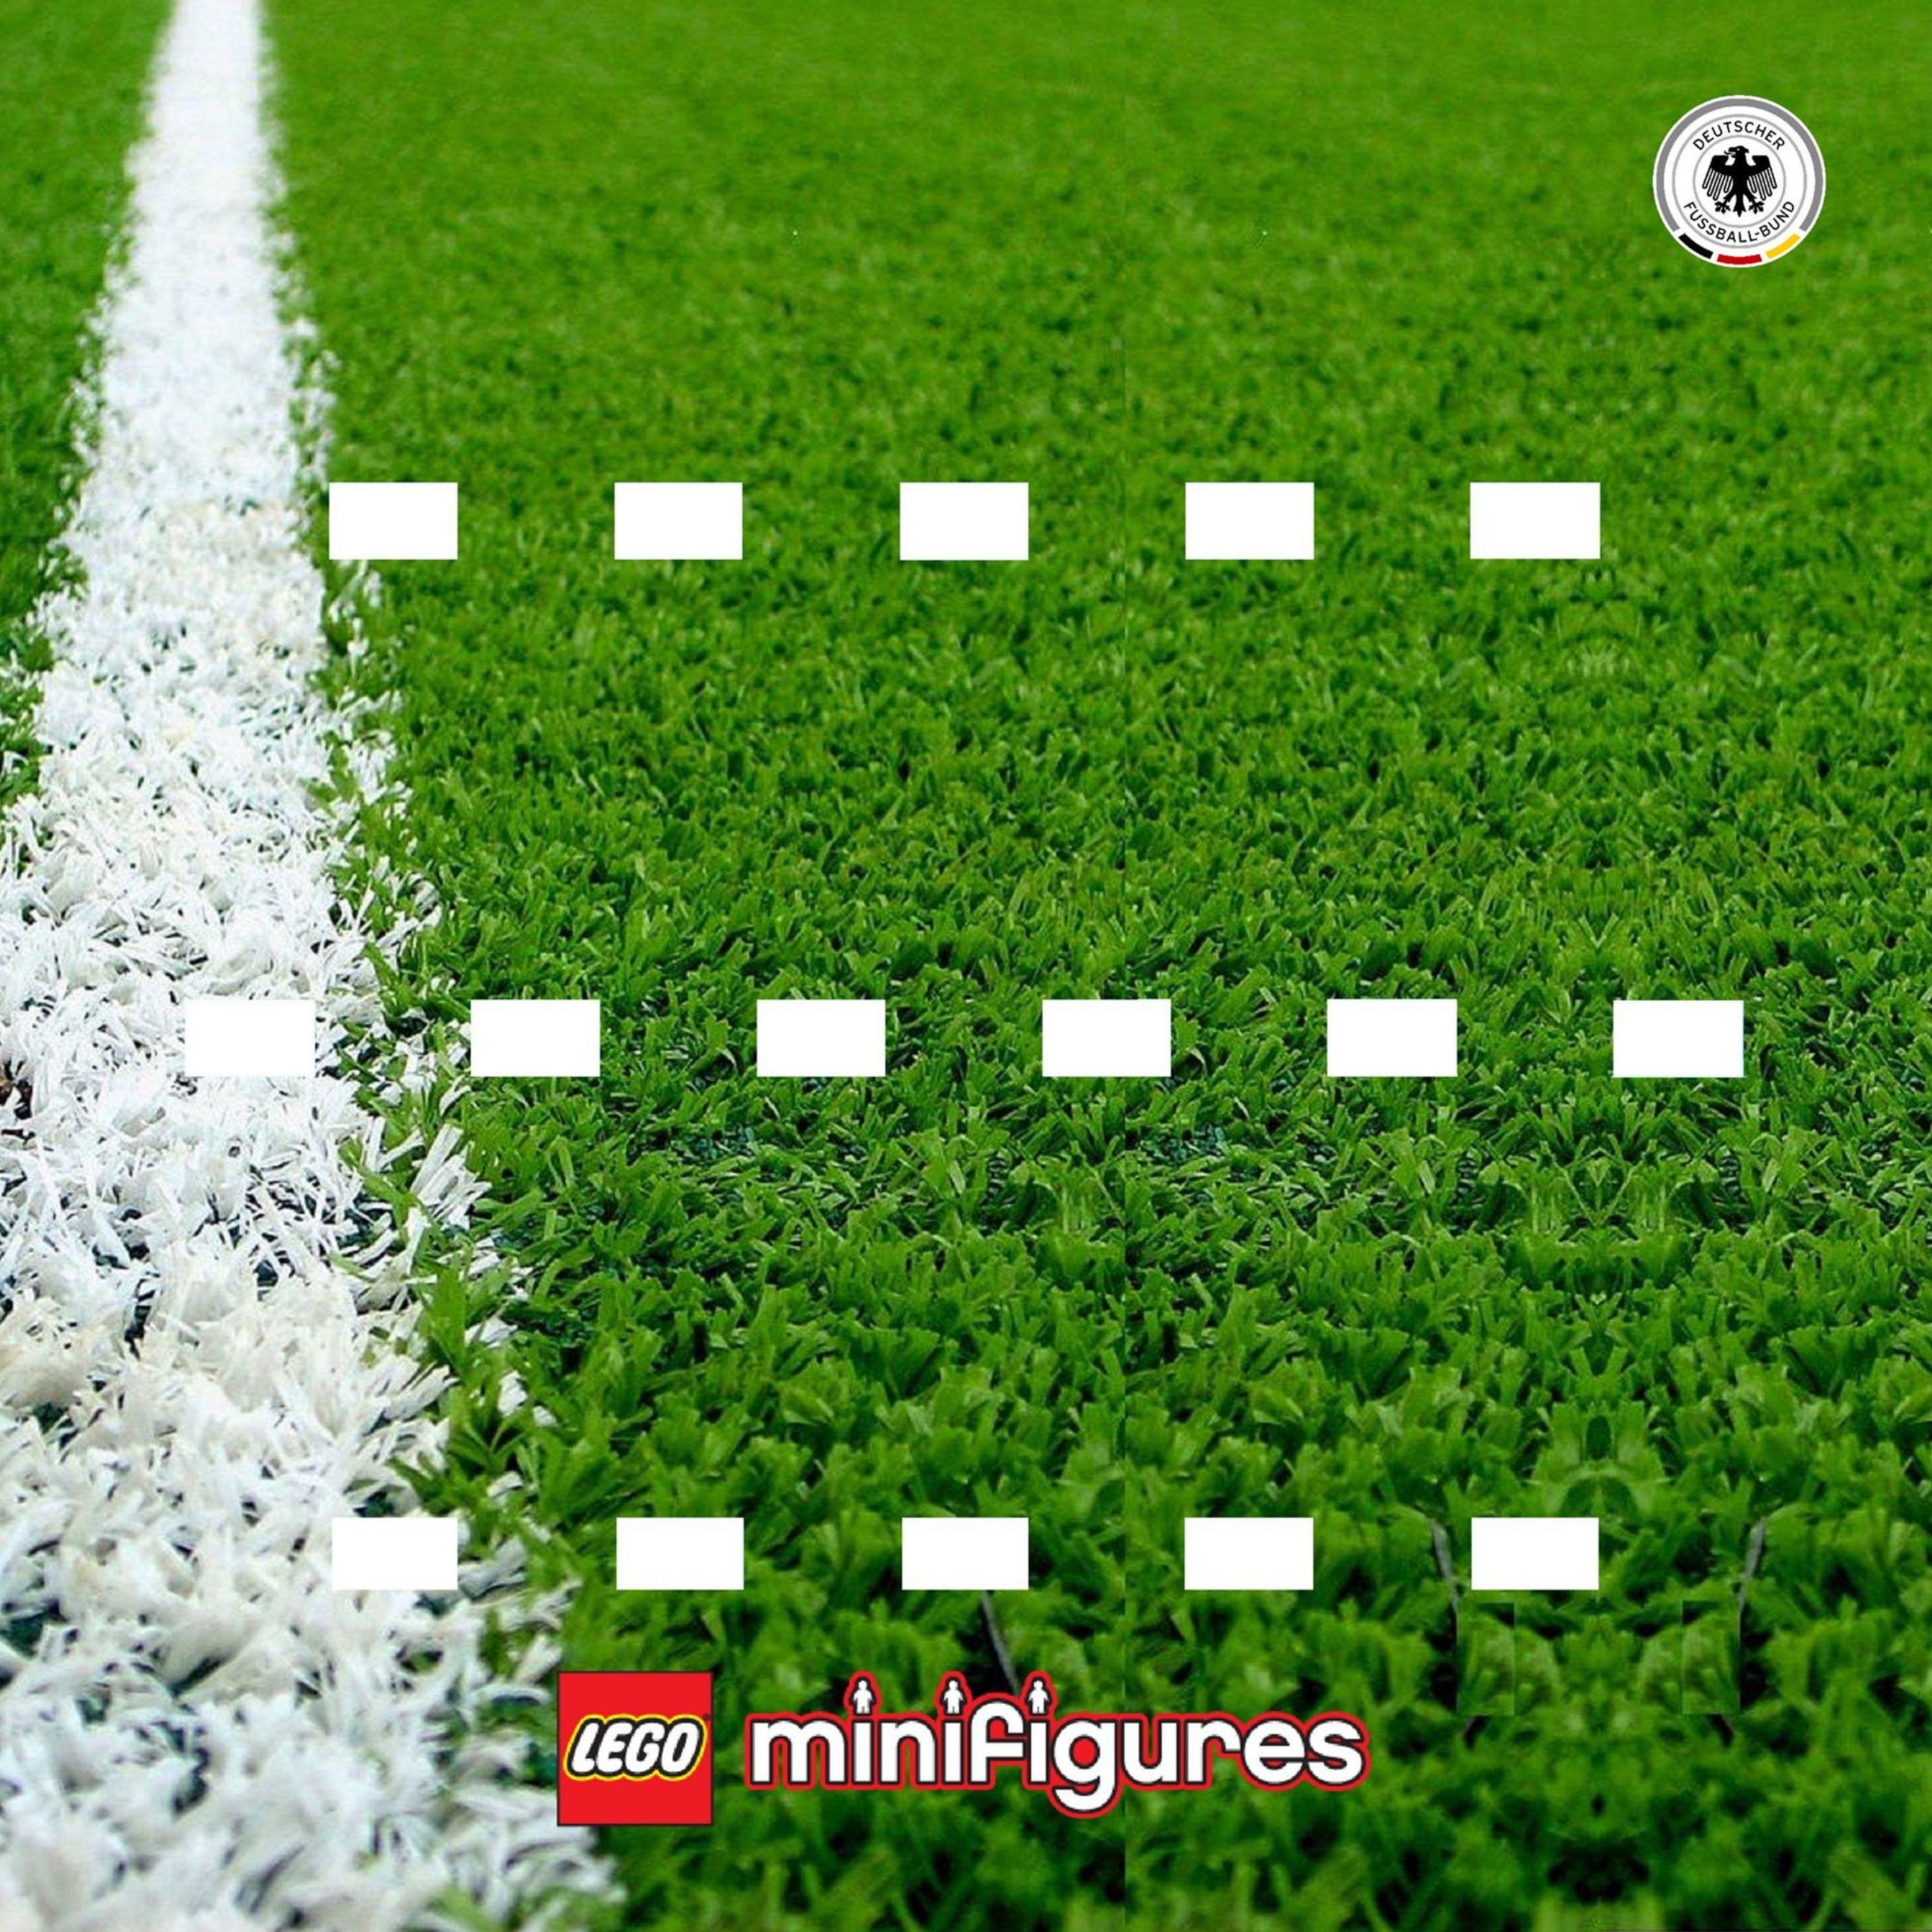 LEGO Minifigures 71014 DFB - Die Mannschaft - Soccer Field - by Sergio - Display Frame Background 230mm - Clicca sull'immagine per scaricarla gratuitamente!